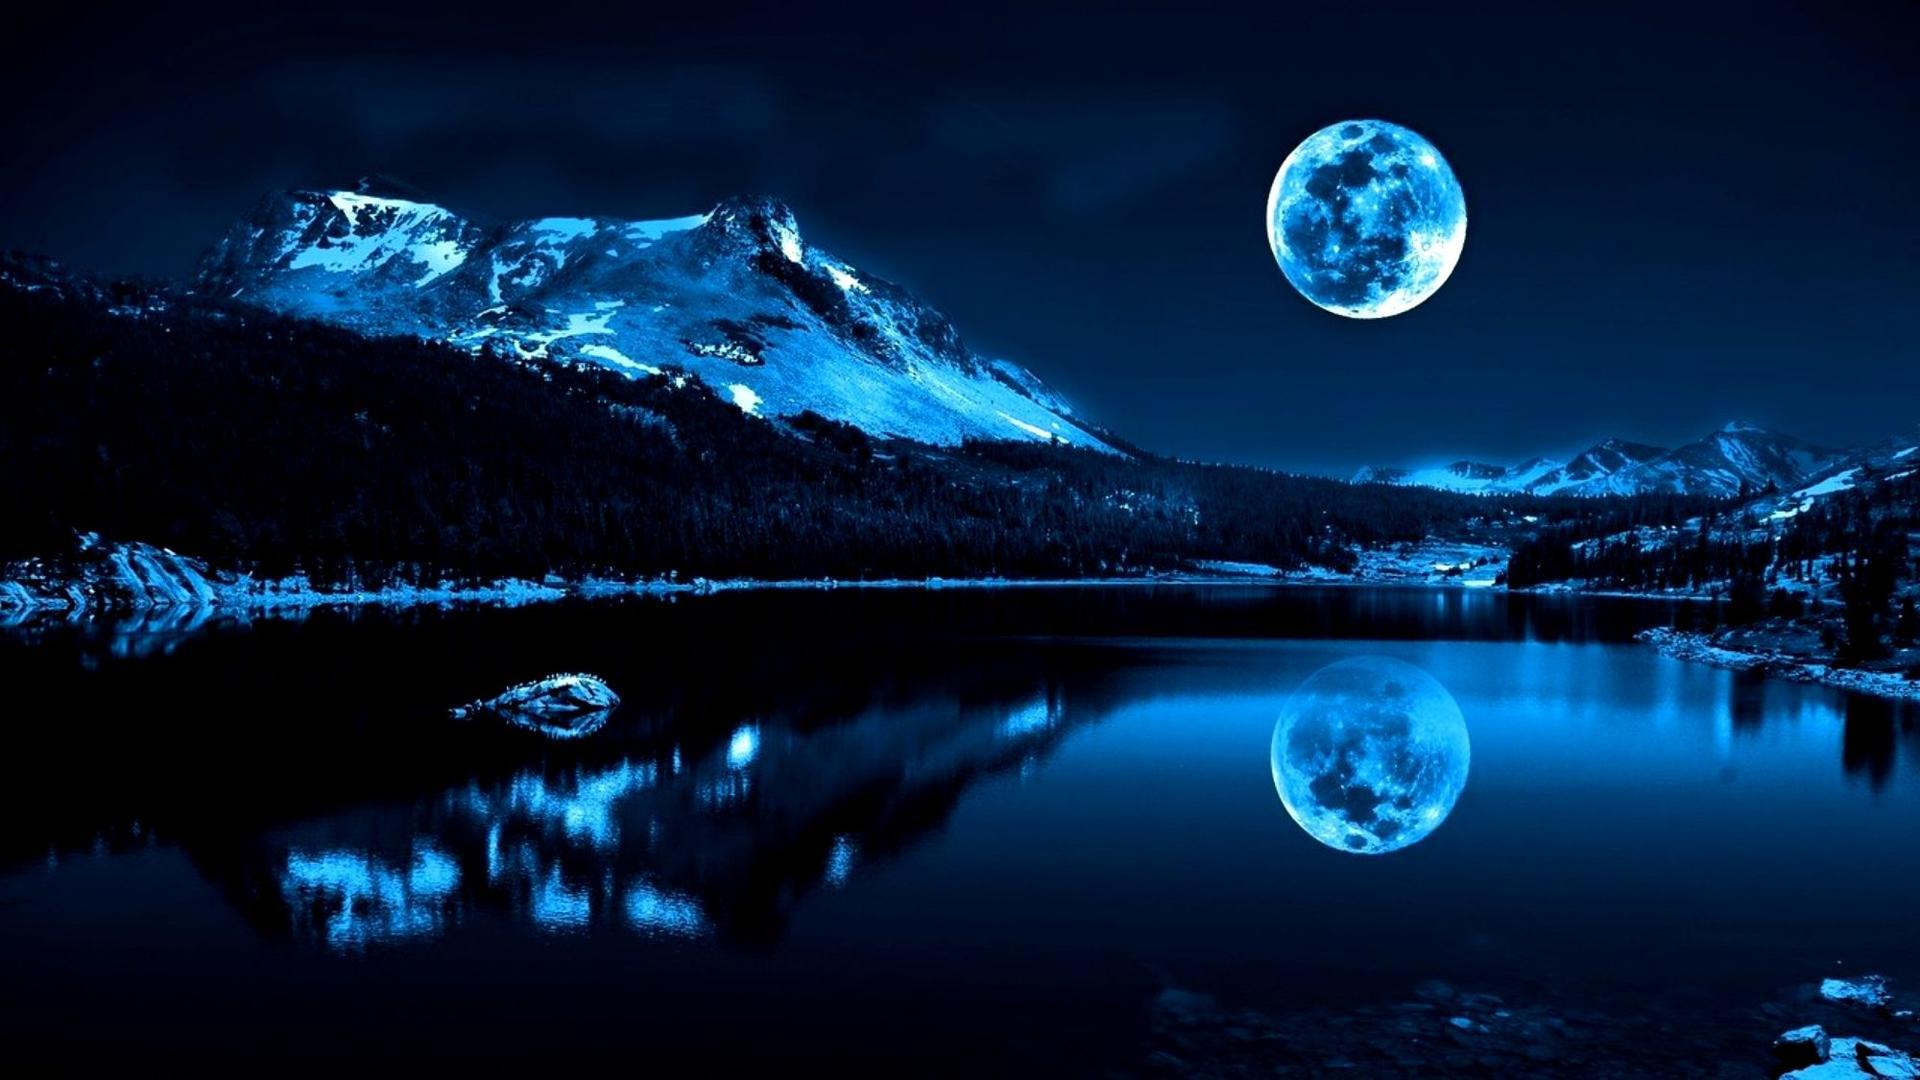 Cars 2 Cartoon Wallpaper Full Moon In A Winter Night Wallpaper Download 1920x1080